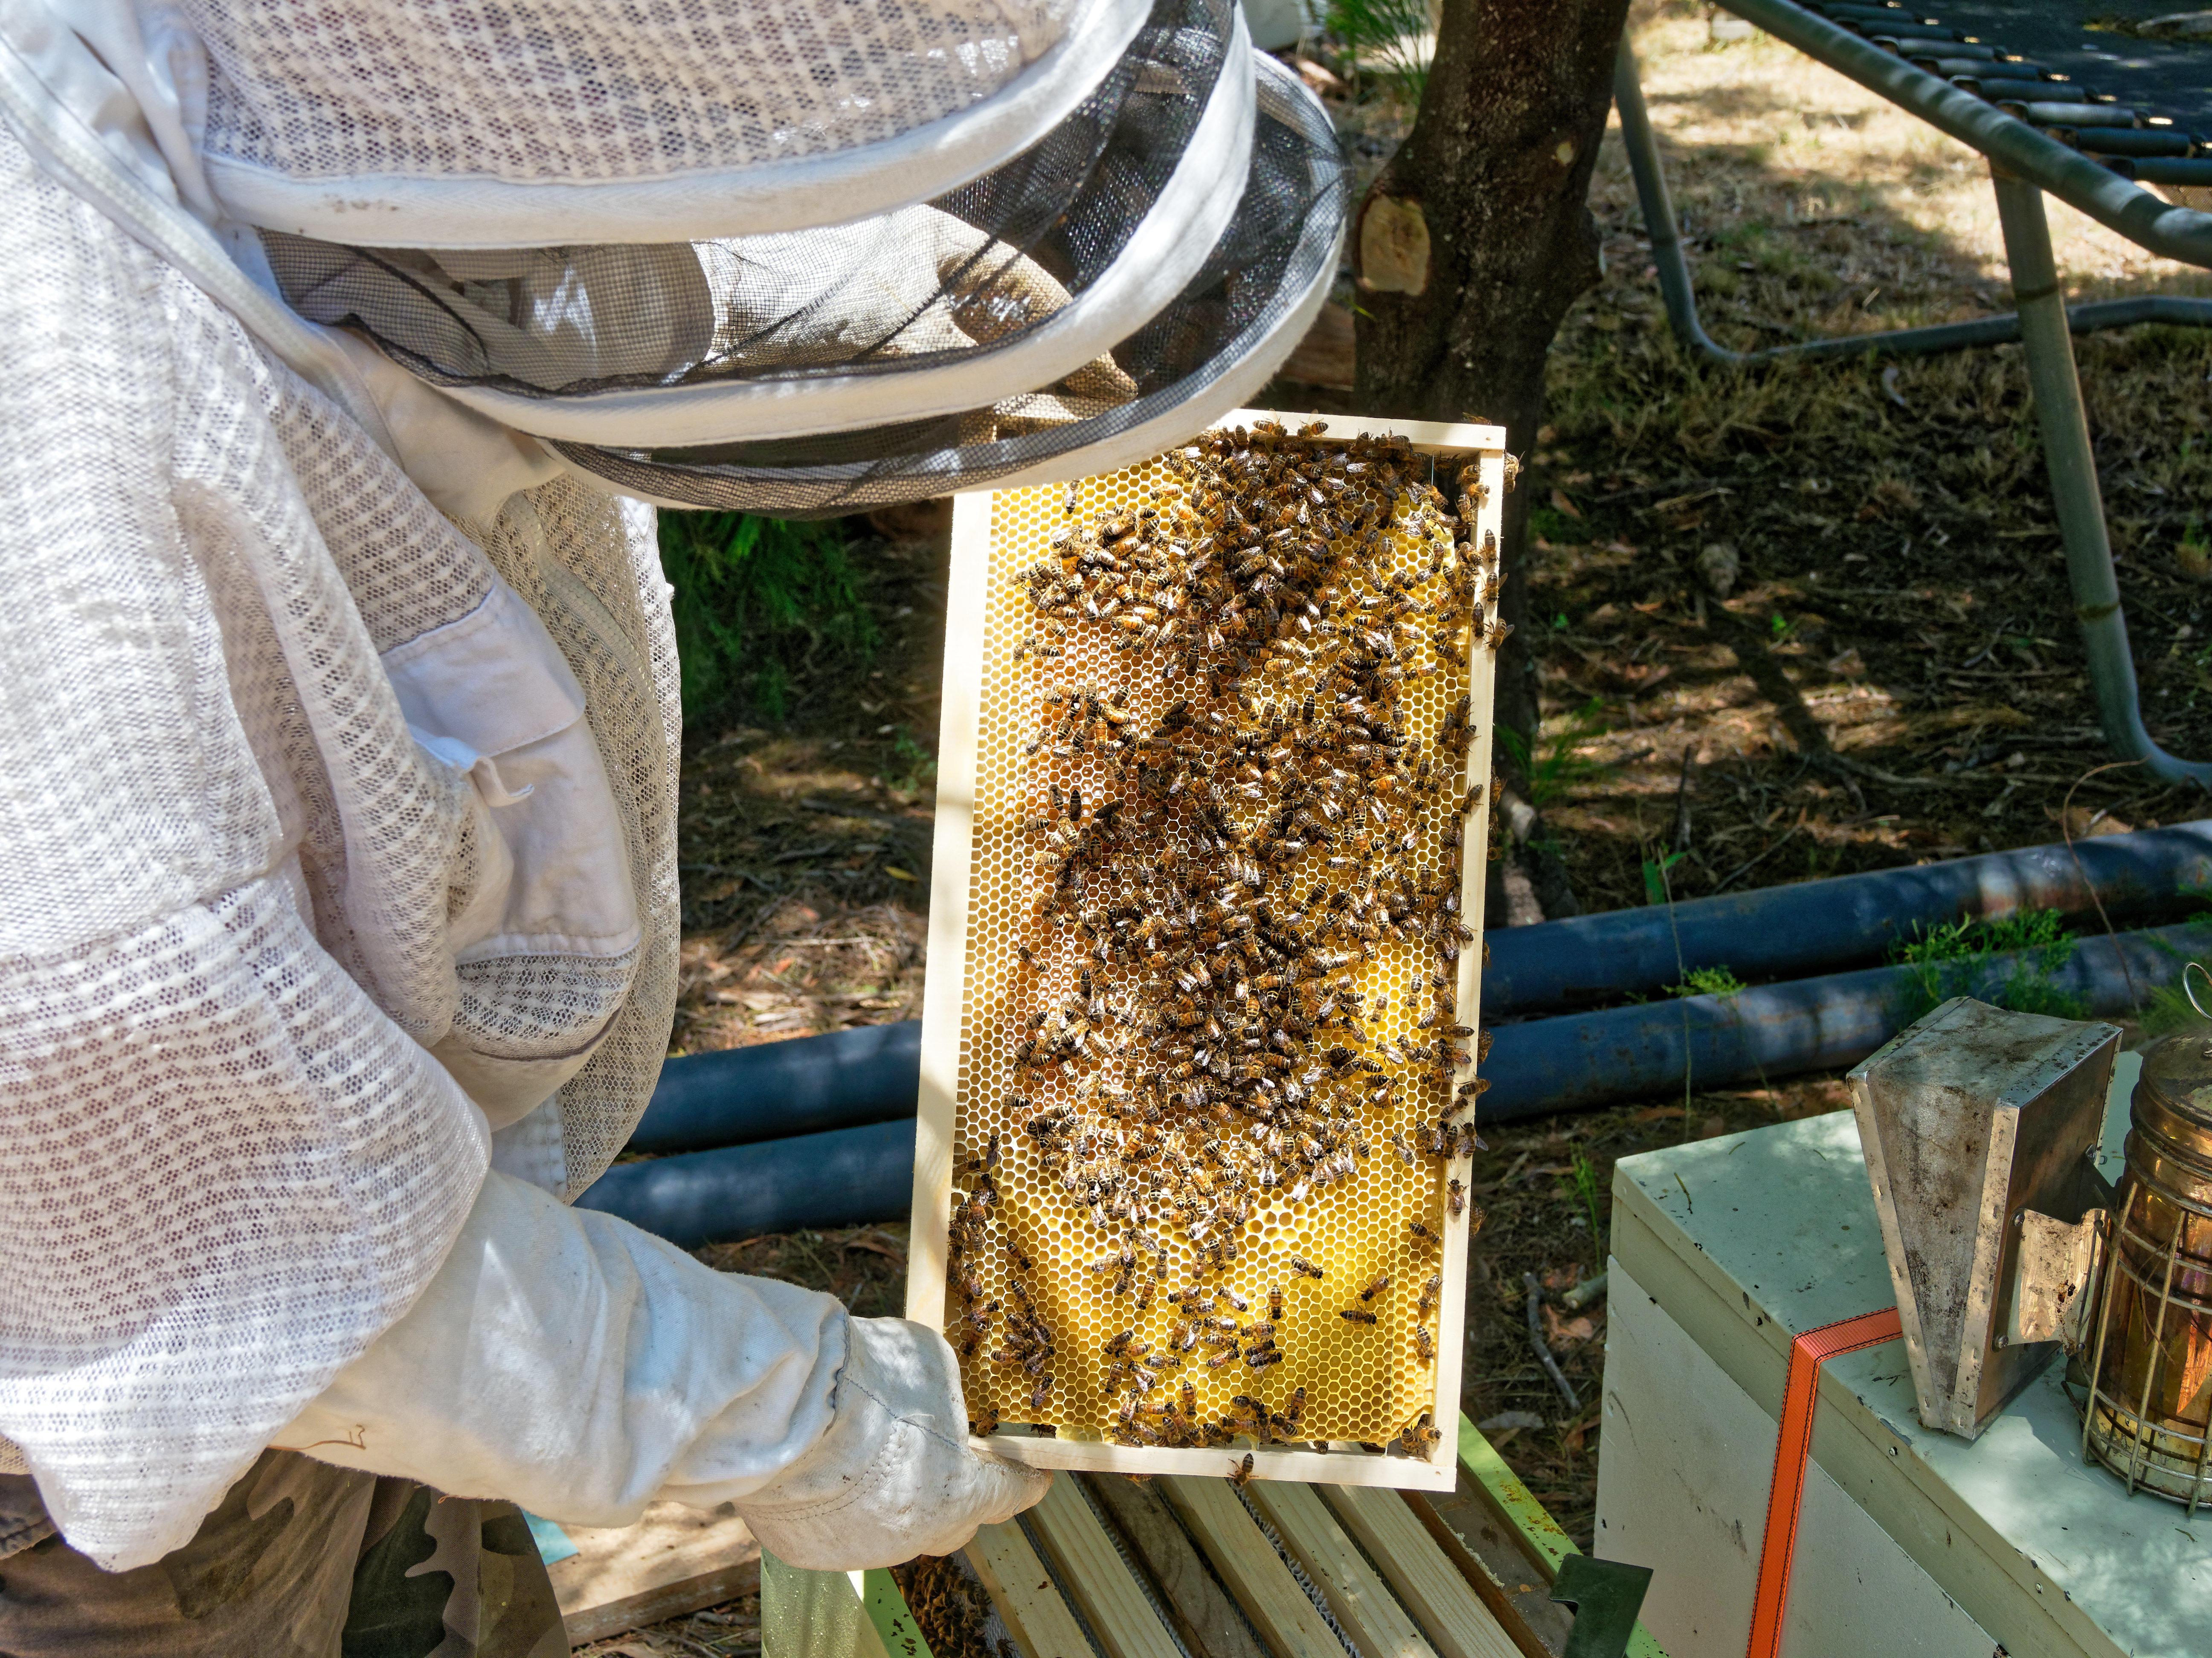 Inspecting-beehives-25.jpeg